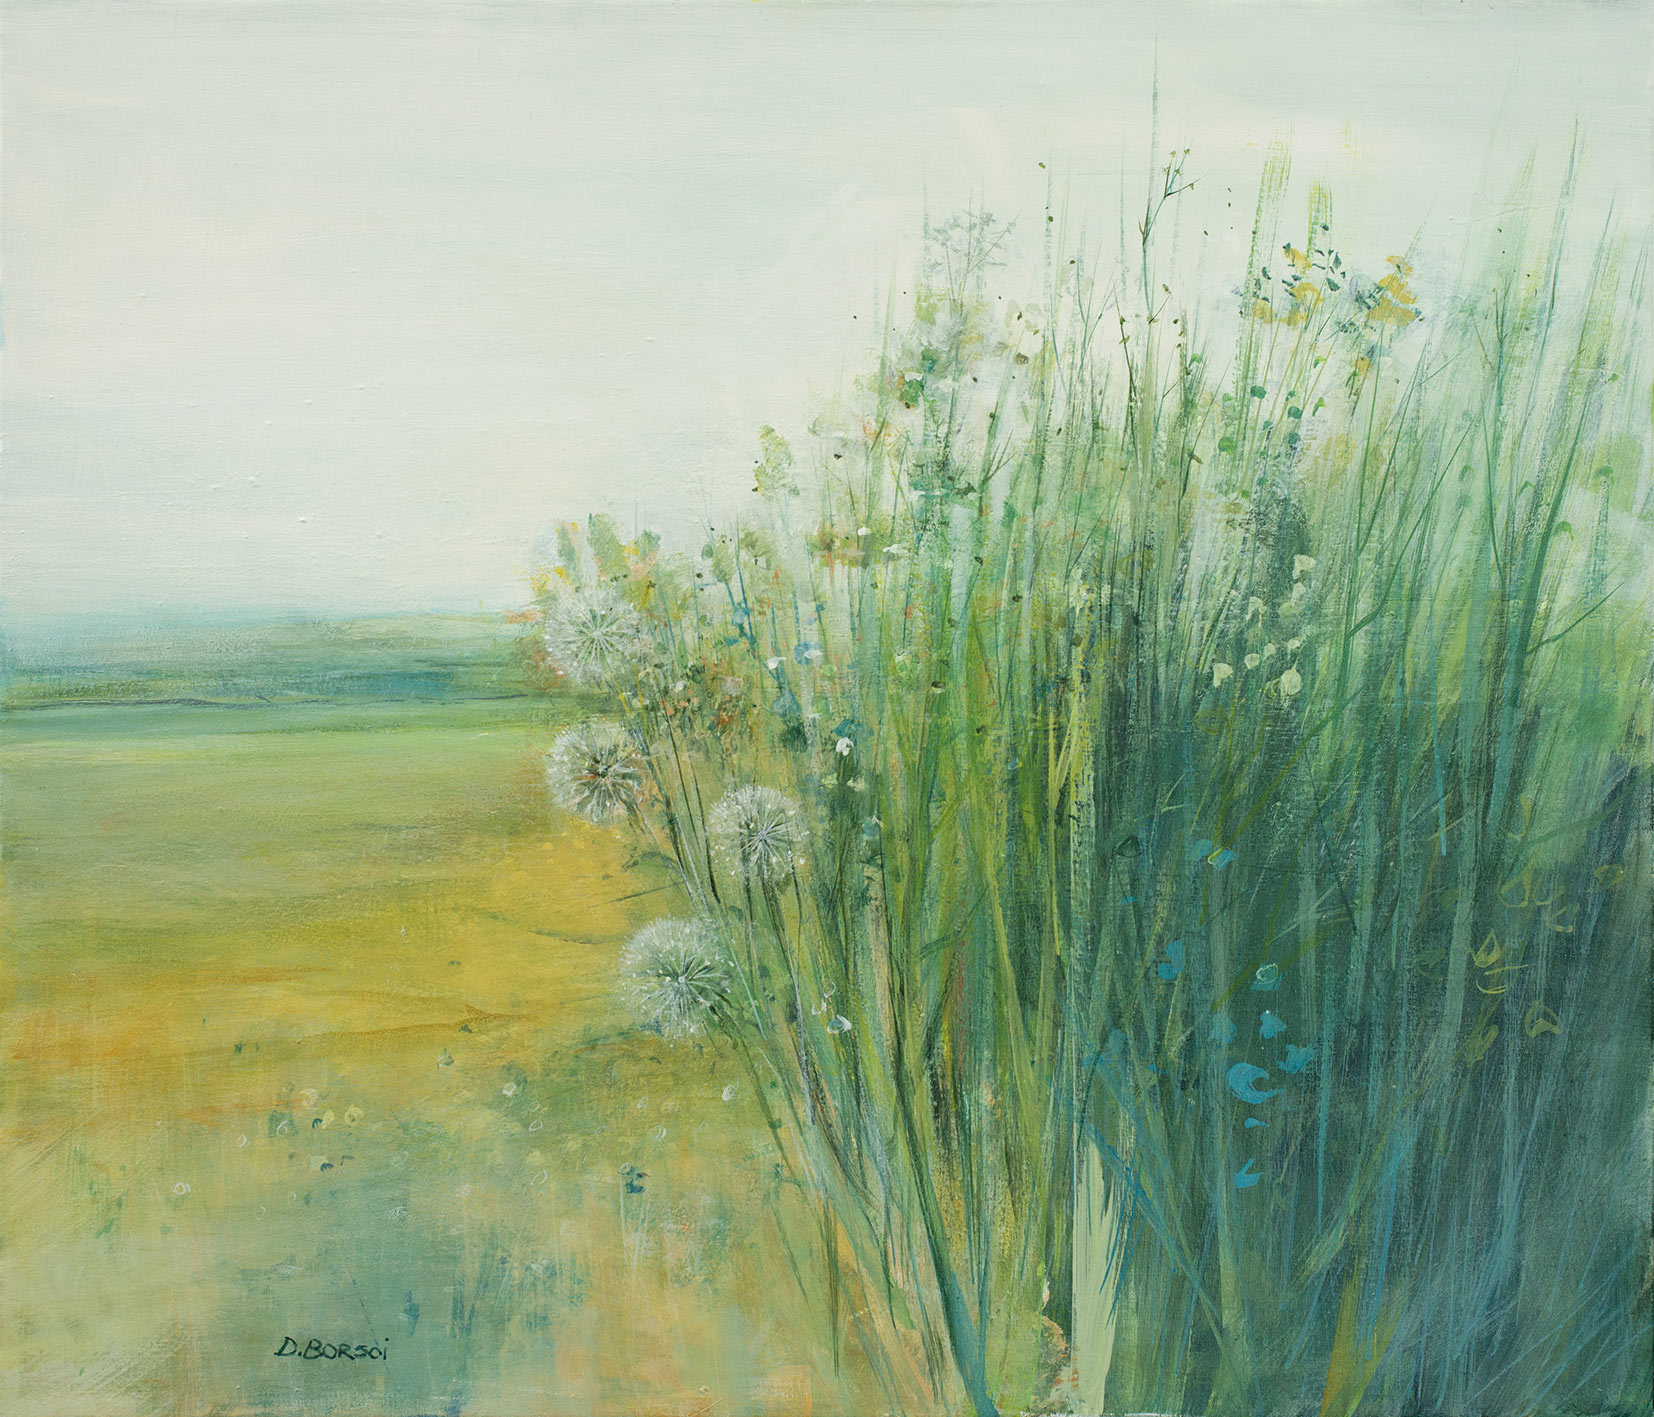 Daniela Borsoi - Soffioni tra l'erba